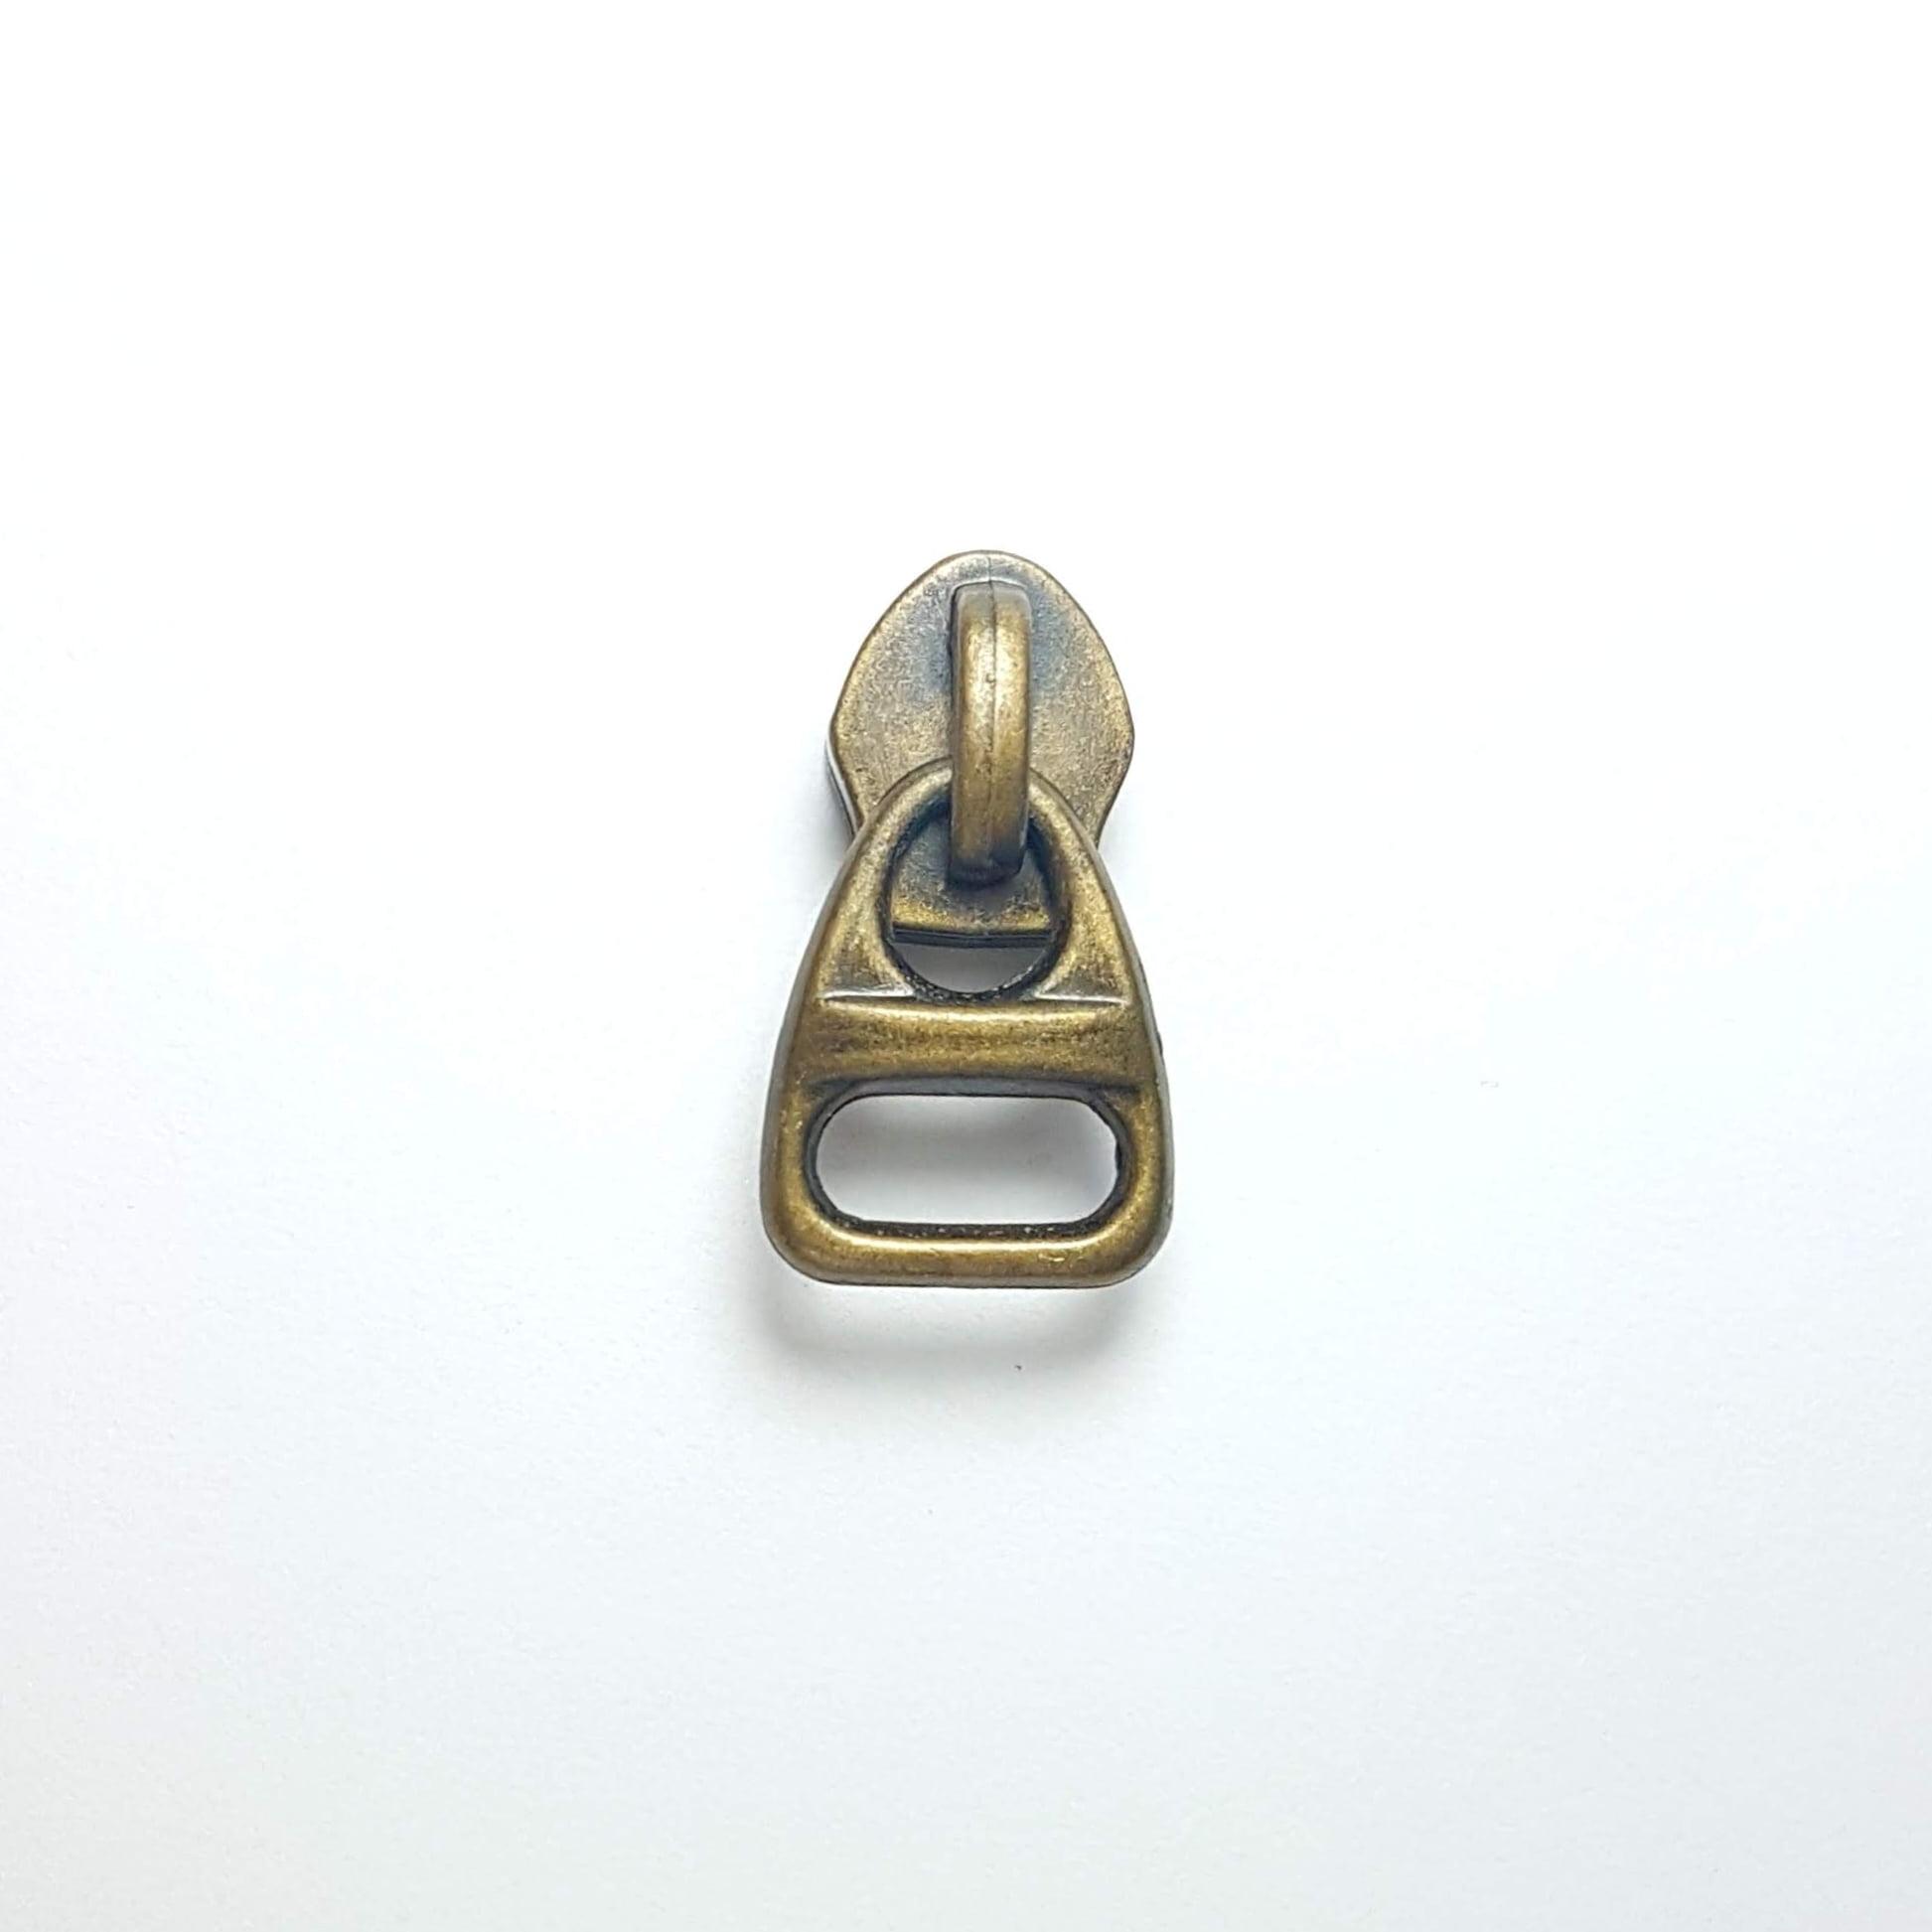 Cursor N.º 5 - Ref. 506 - Ouro Velho